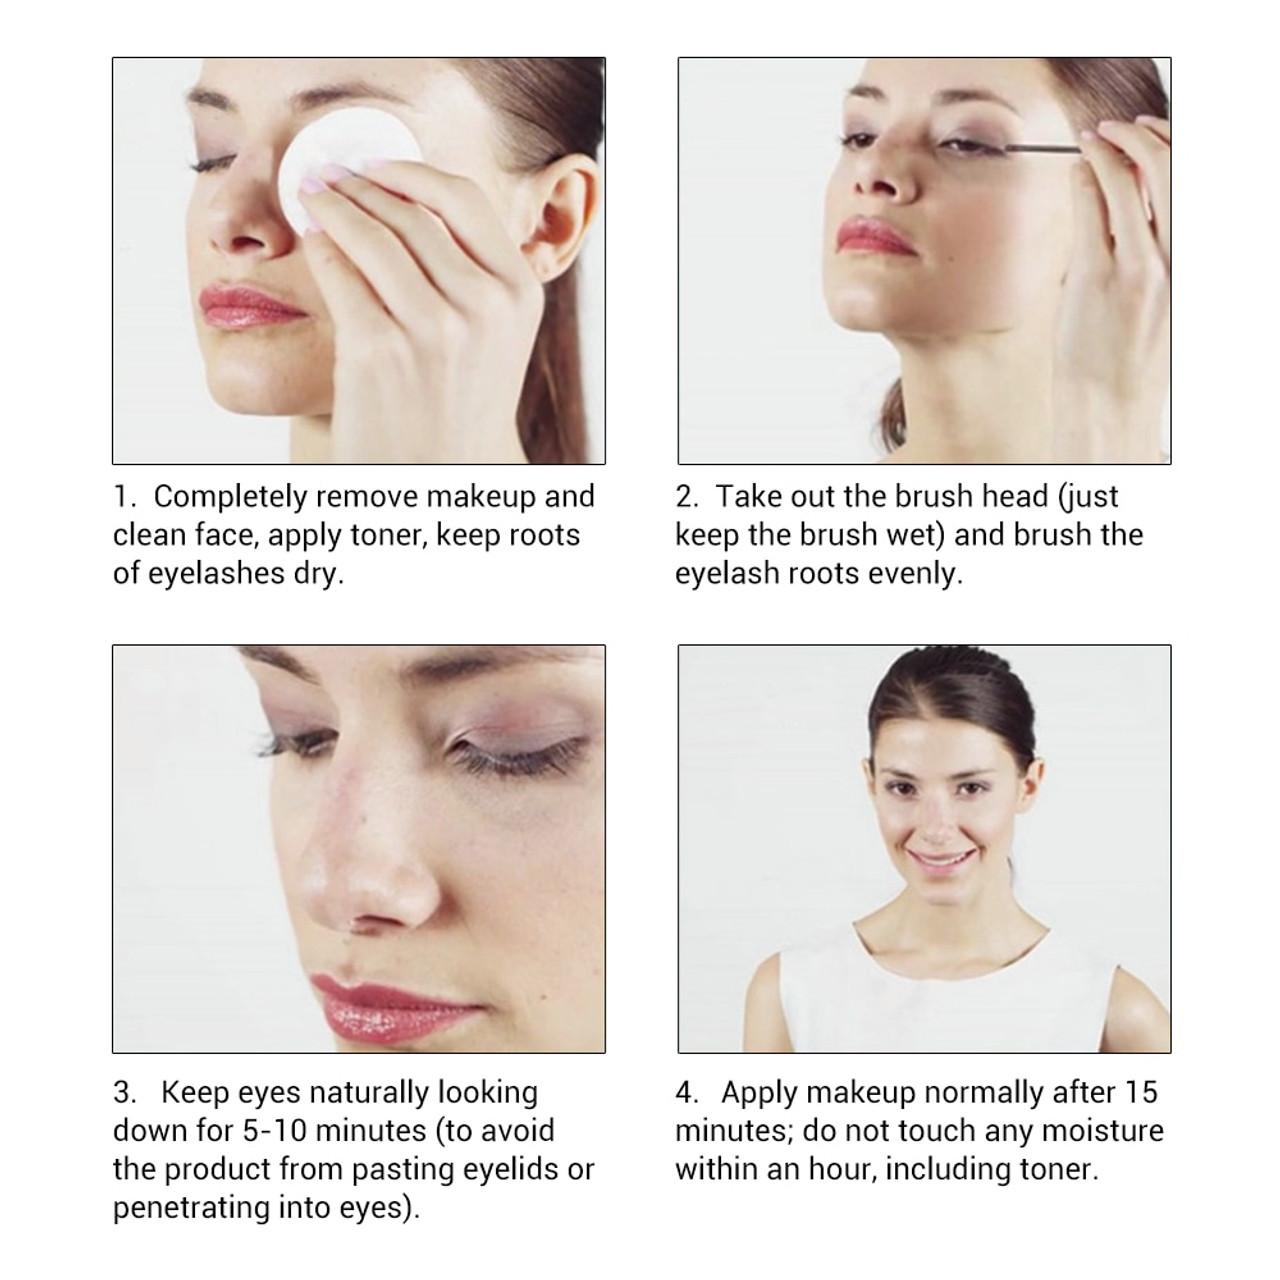 ade03b6cb44 ... LANBENA Eyelash Growth Eye Serum 7 Day Eyelash Enhancer Longer Fuller  Thicker Lashes Eyelashes and Eyebrows ...